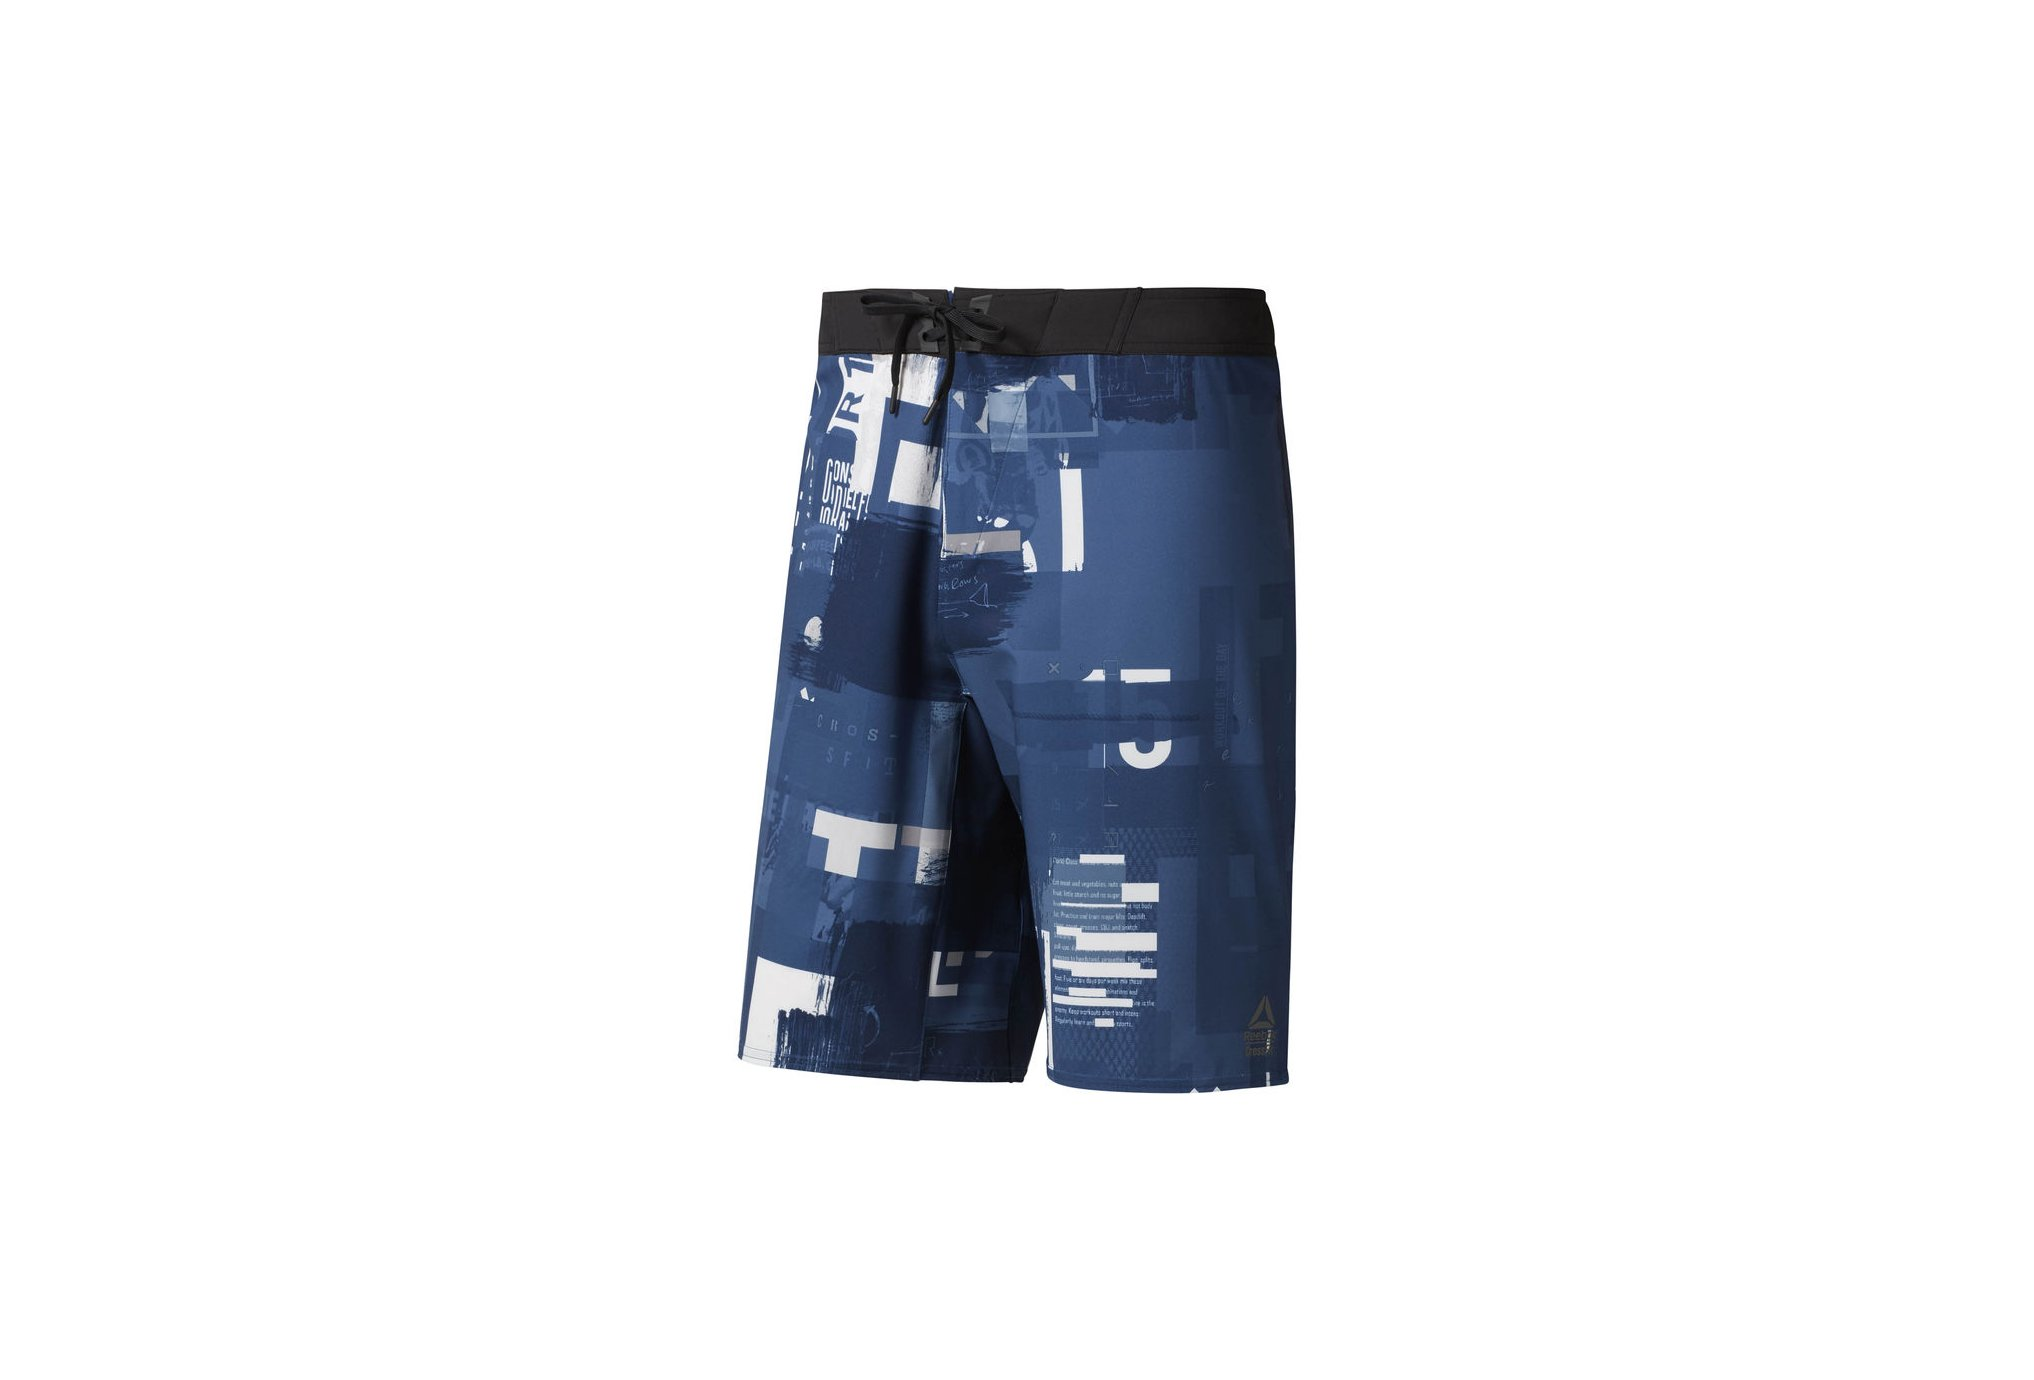 Epic Vêtement Running M Crossfit La Reebok Cordlock Homme Fortifiée zVpGUMSq